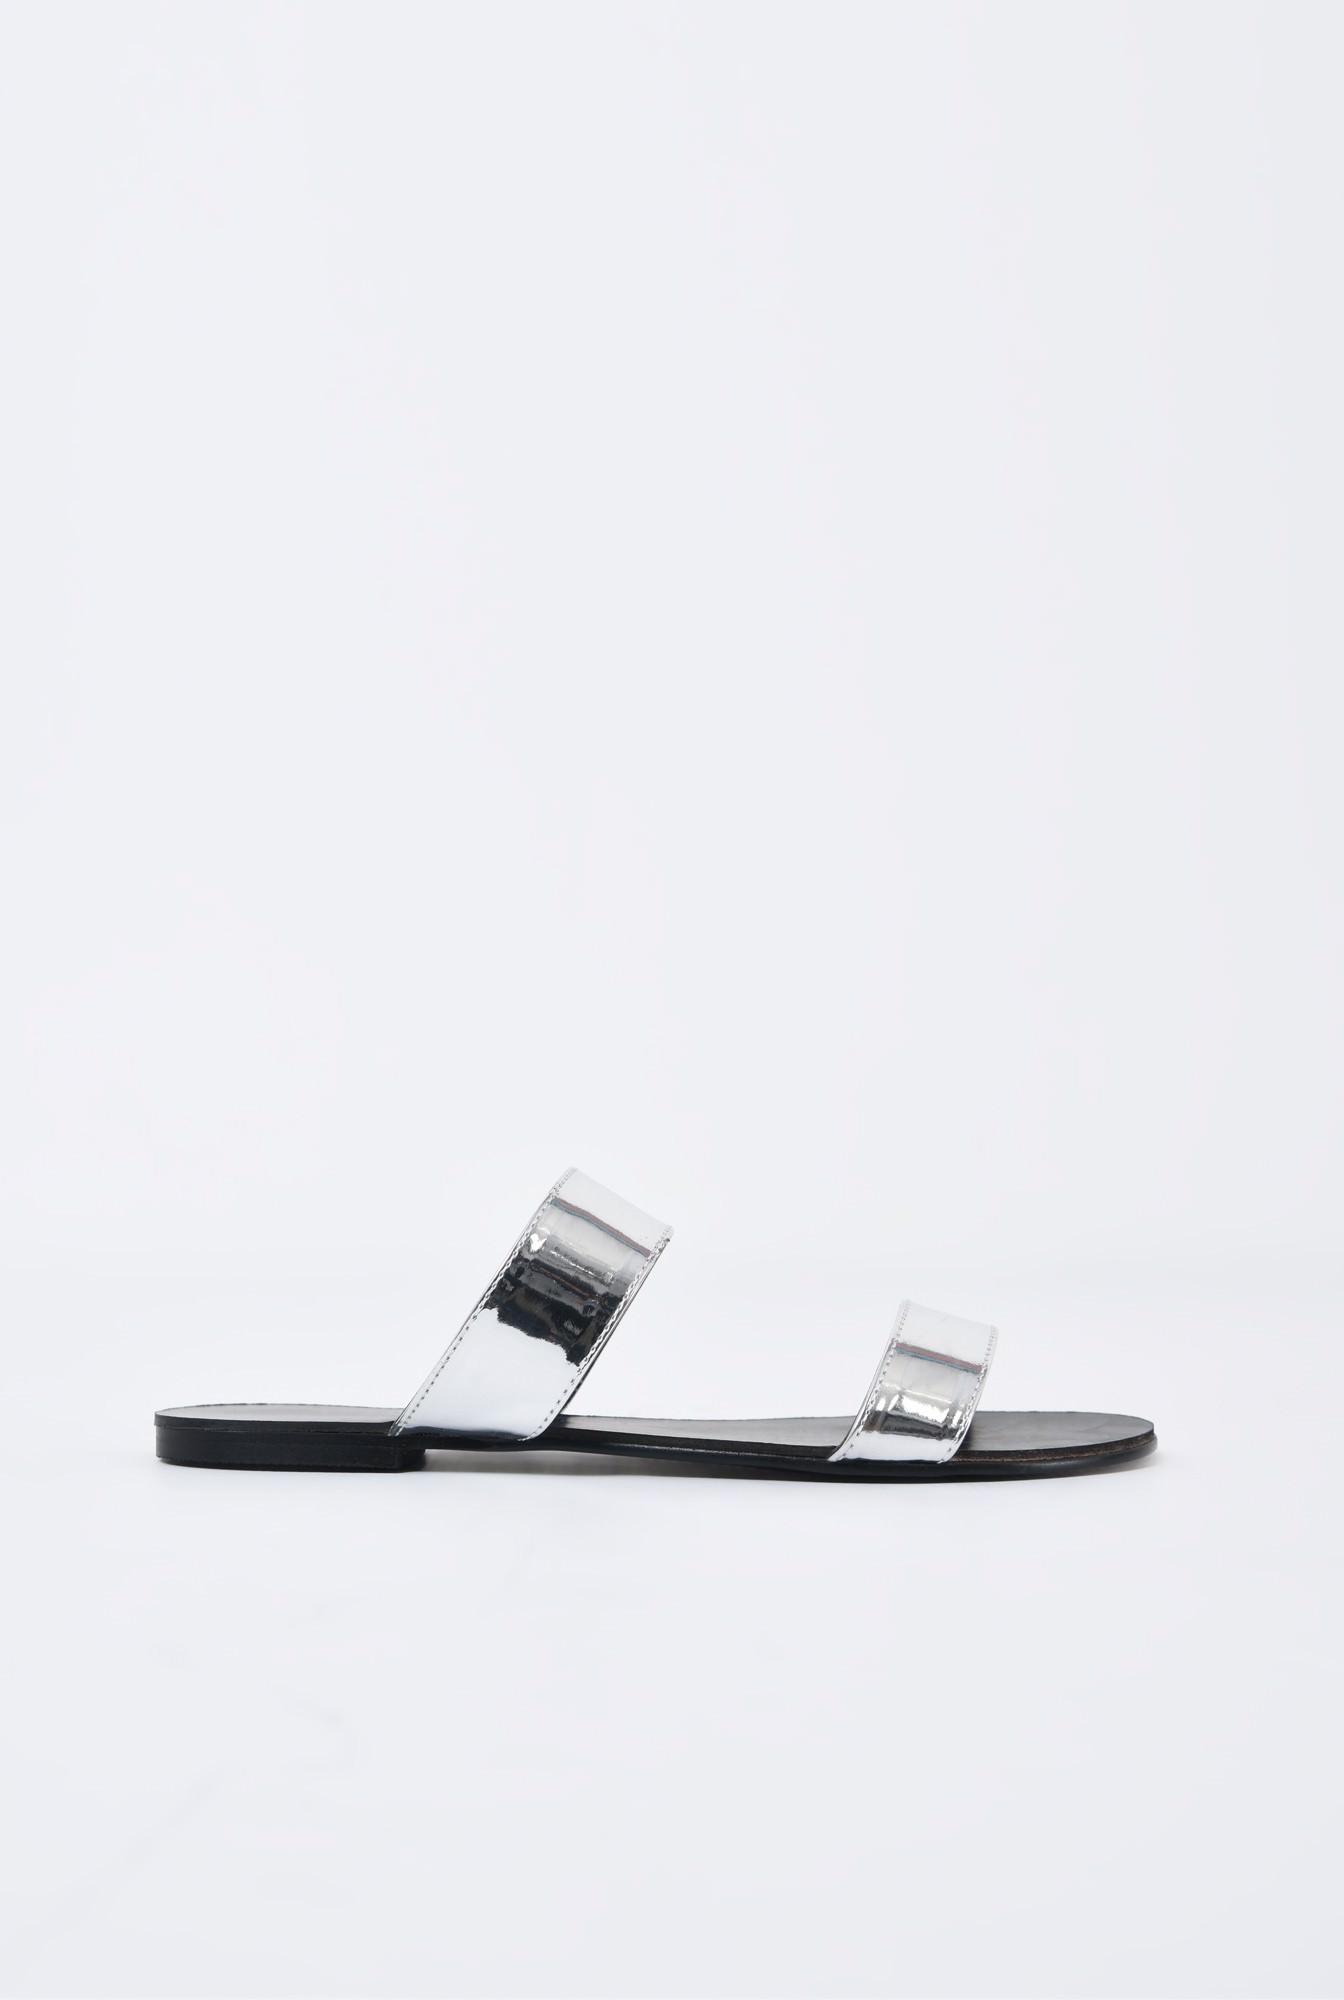 0 - papuci argintii, aspect metalic, cu talpa joasa